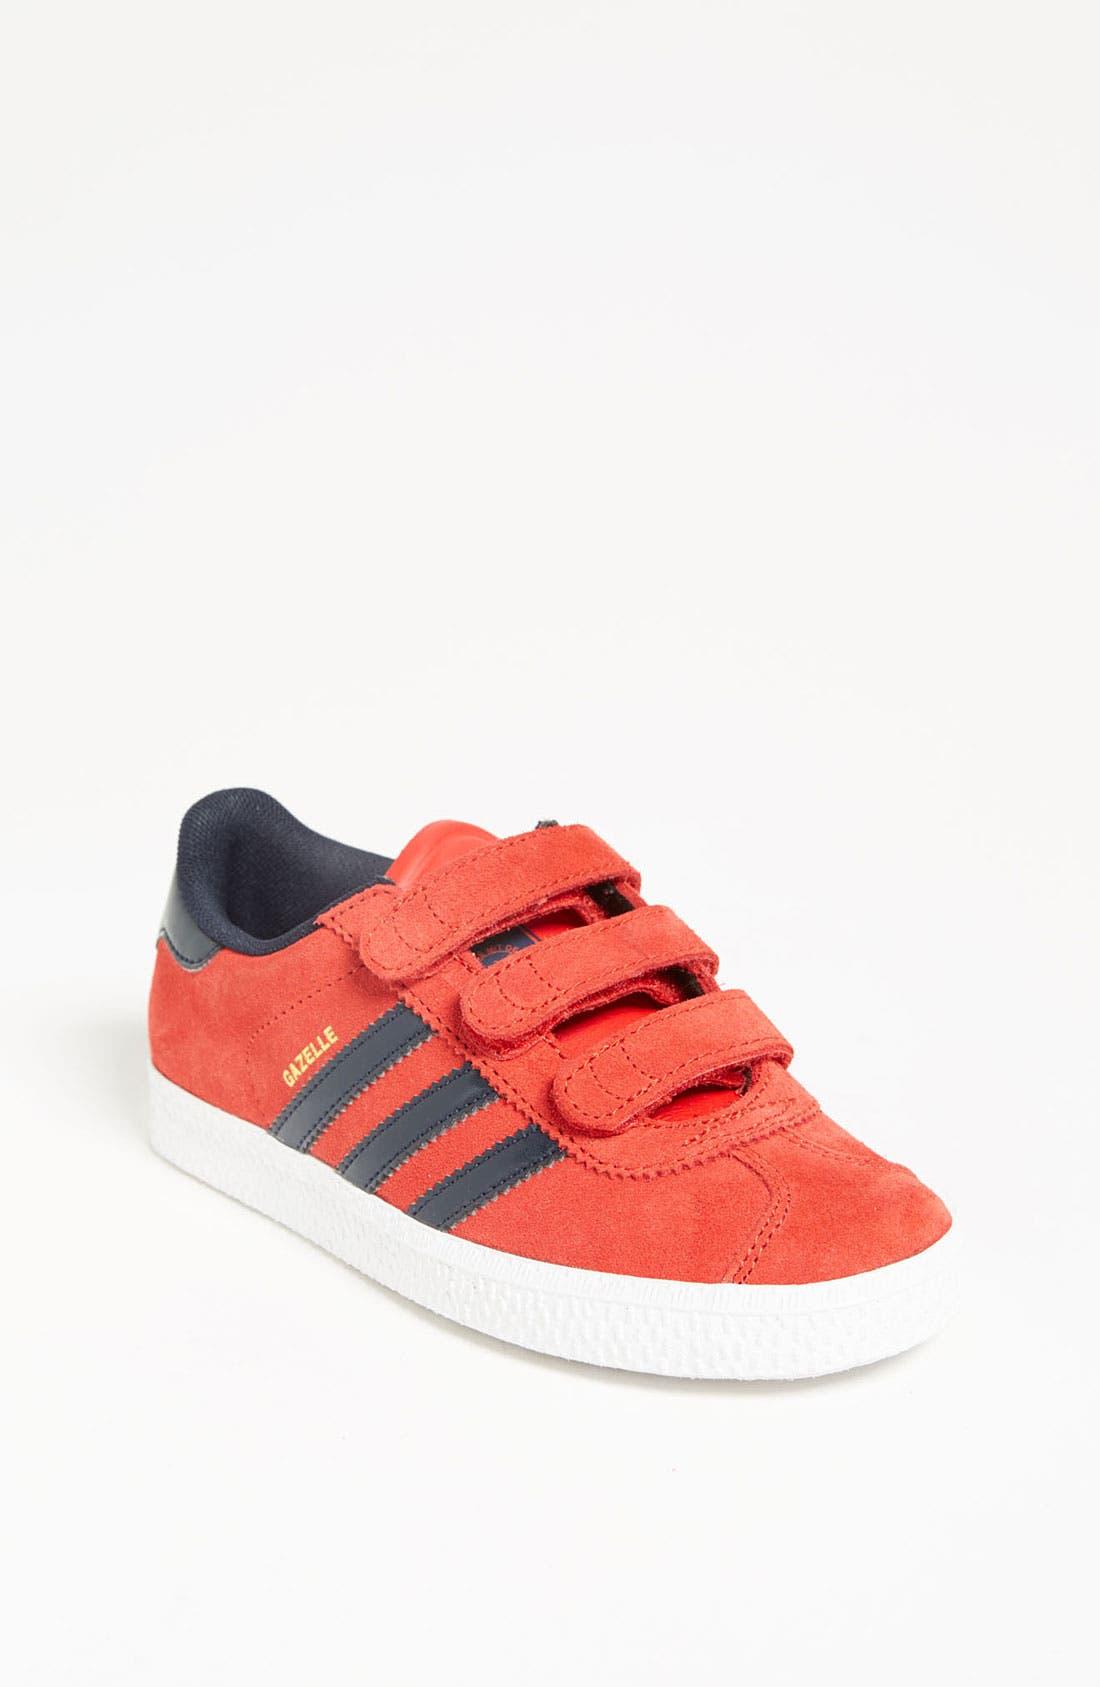 Alternate Image 1 Selected - adidas 'Gazelle' Sneaker (Toddler & Little Kid)